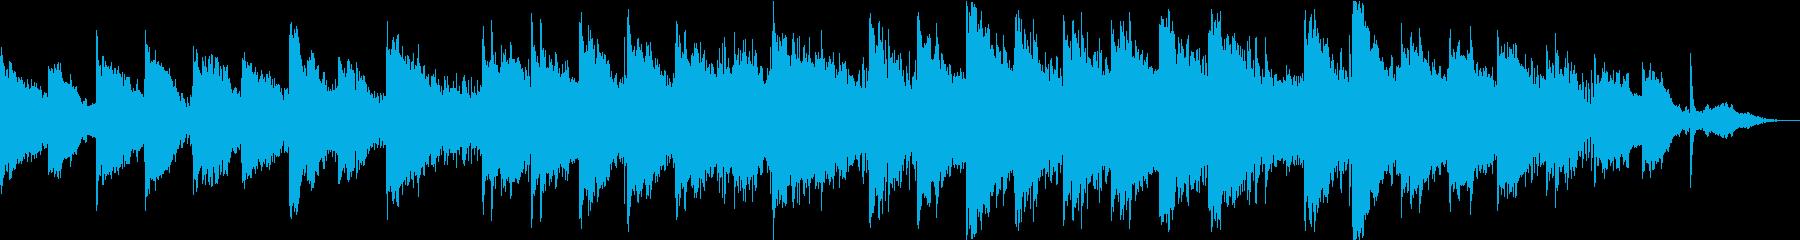 CInematicの再生済みの波形